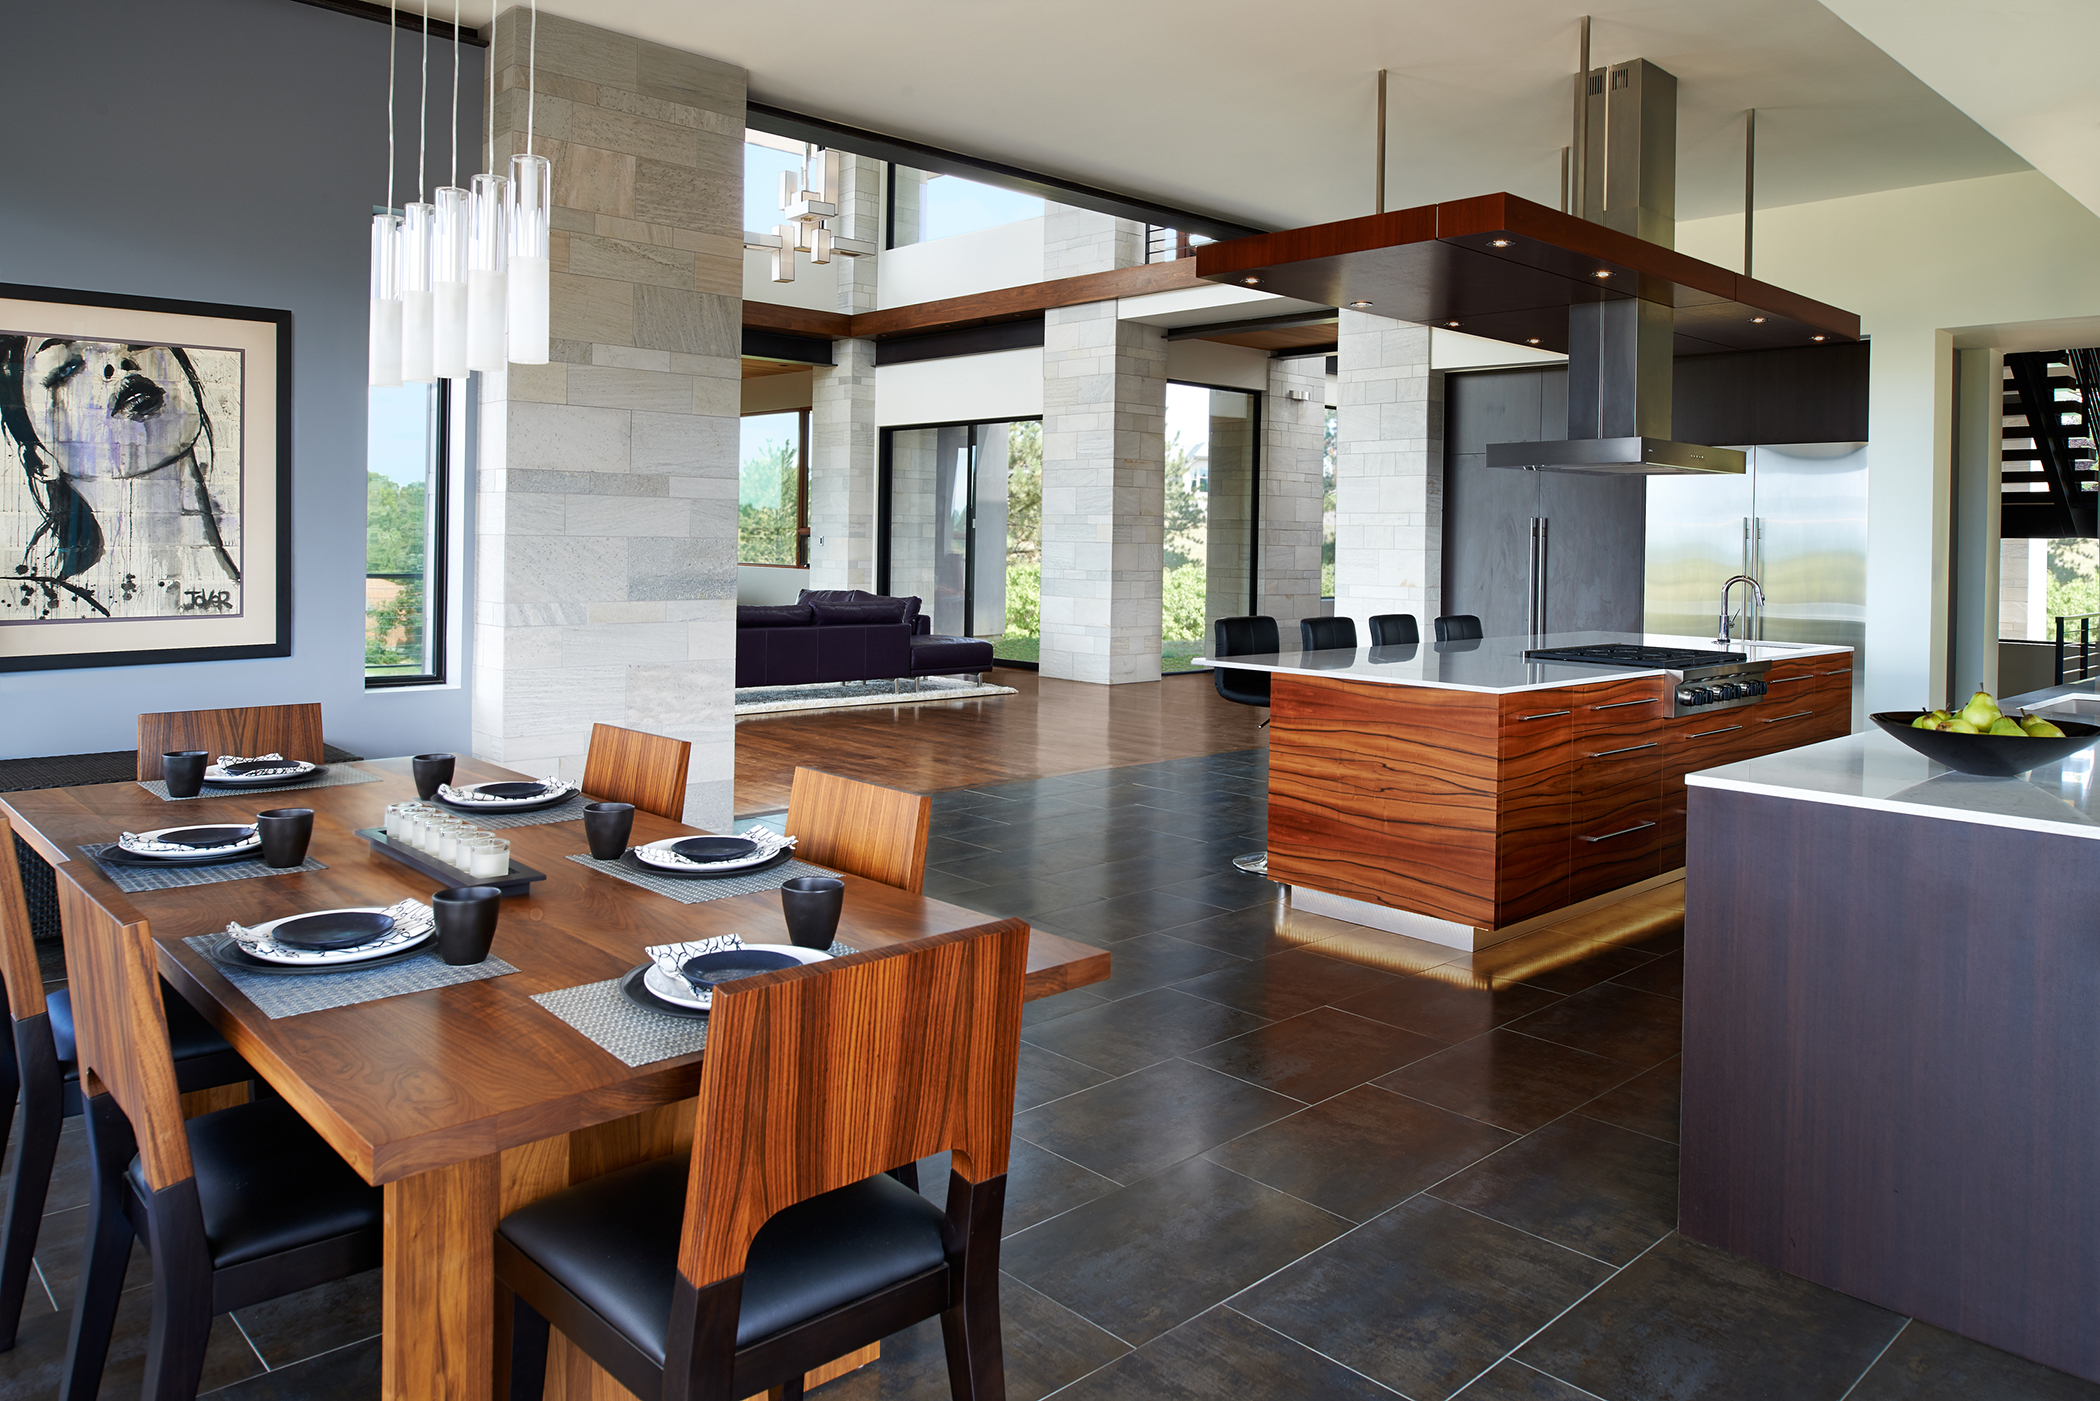 07-CHV Kitchen to Great Rm.jpg